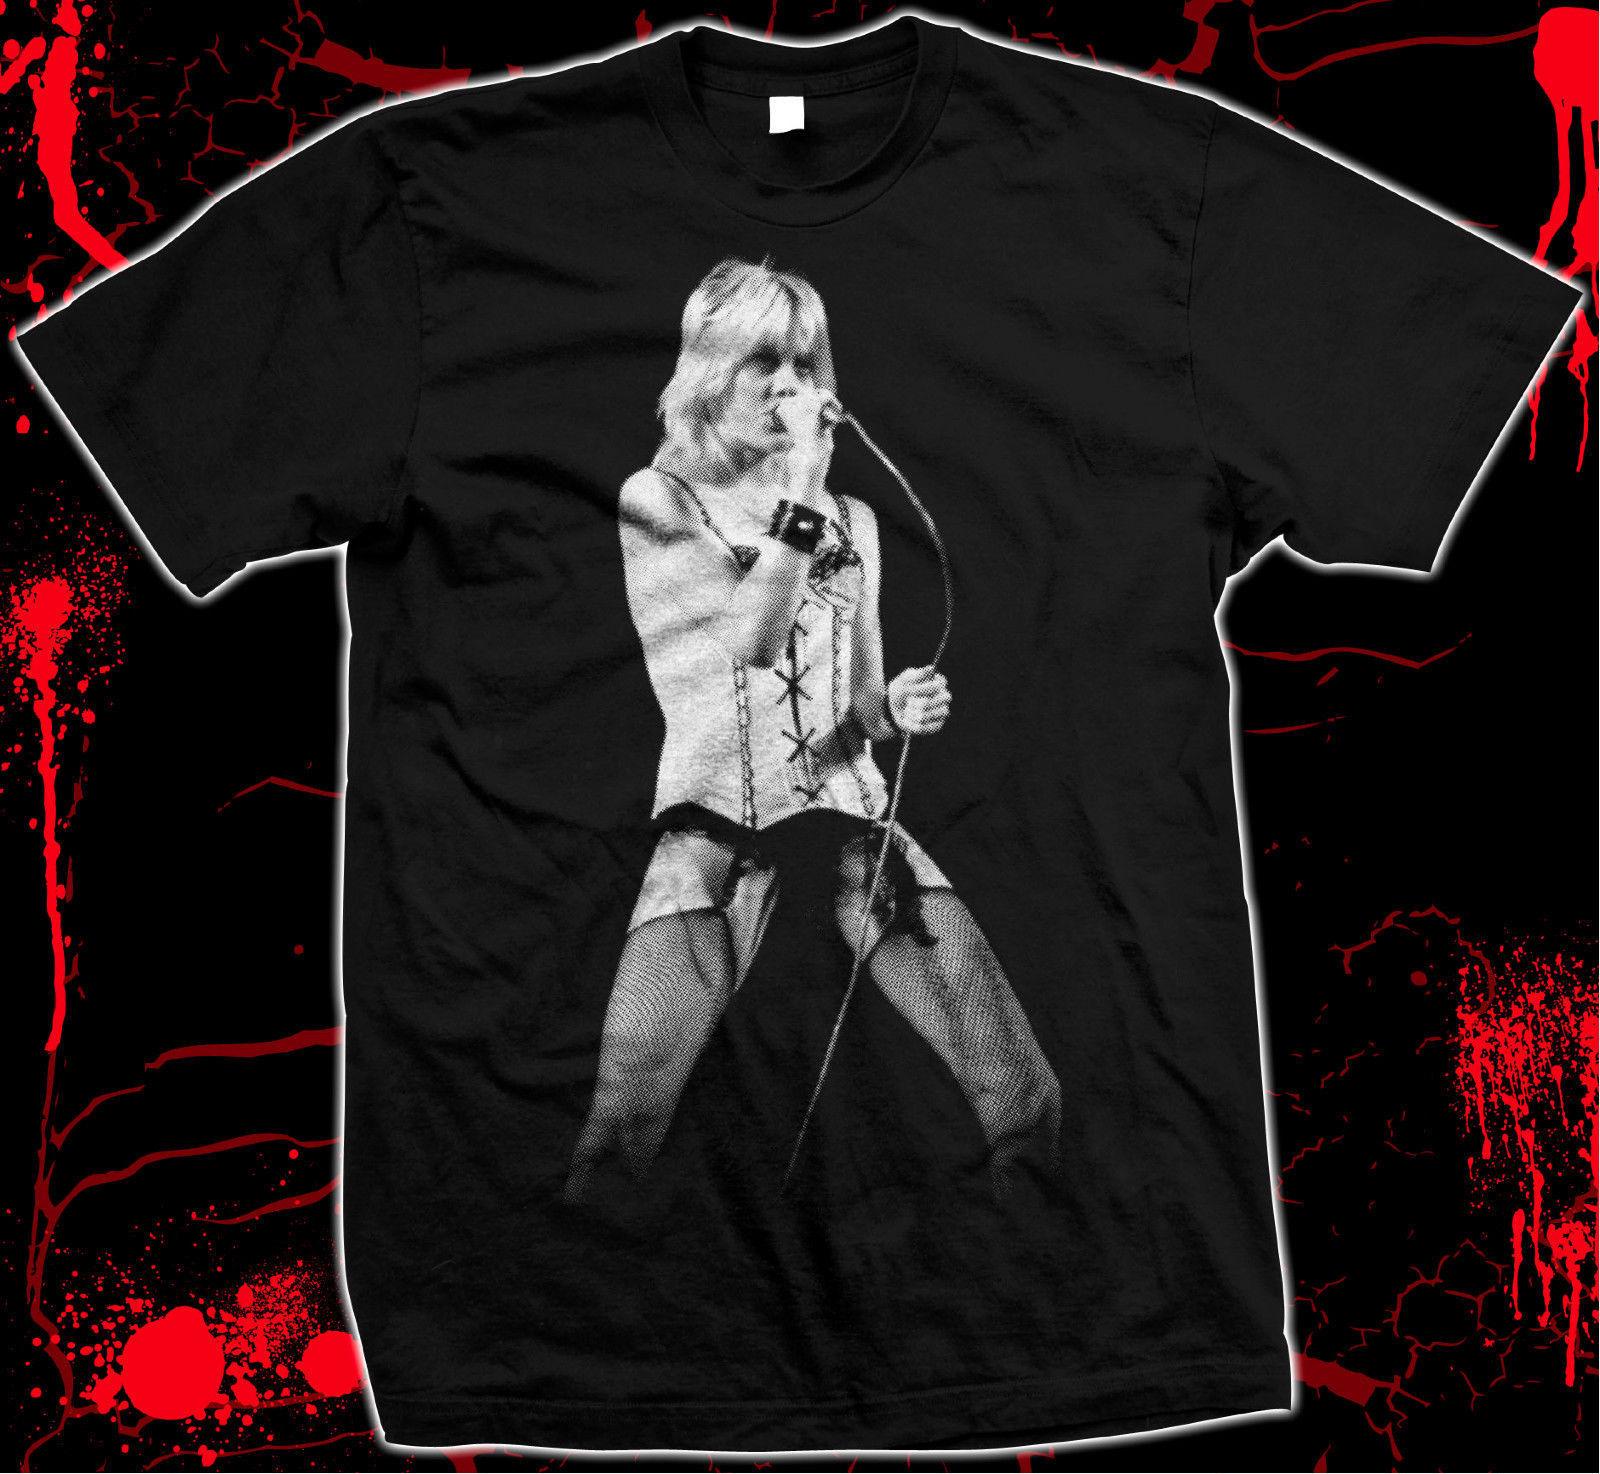 Cherie Currie - Runaways - Pre-shrunk, hand screened 100% cotton t-shirt